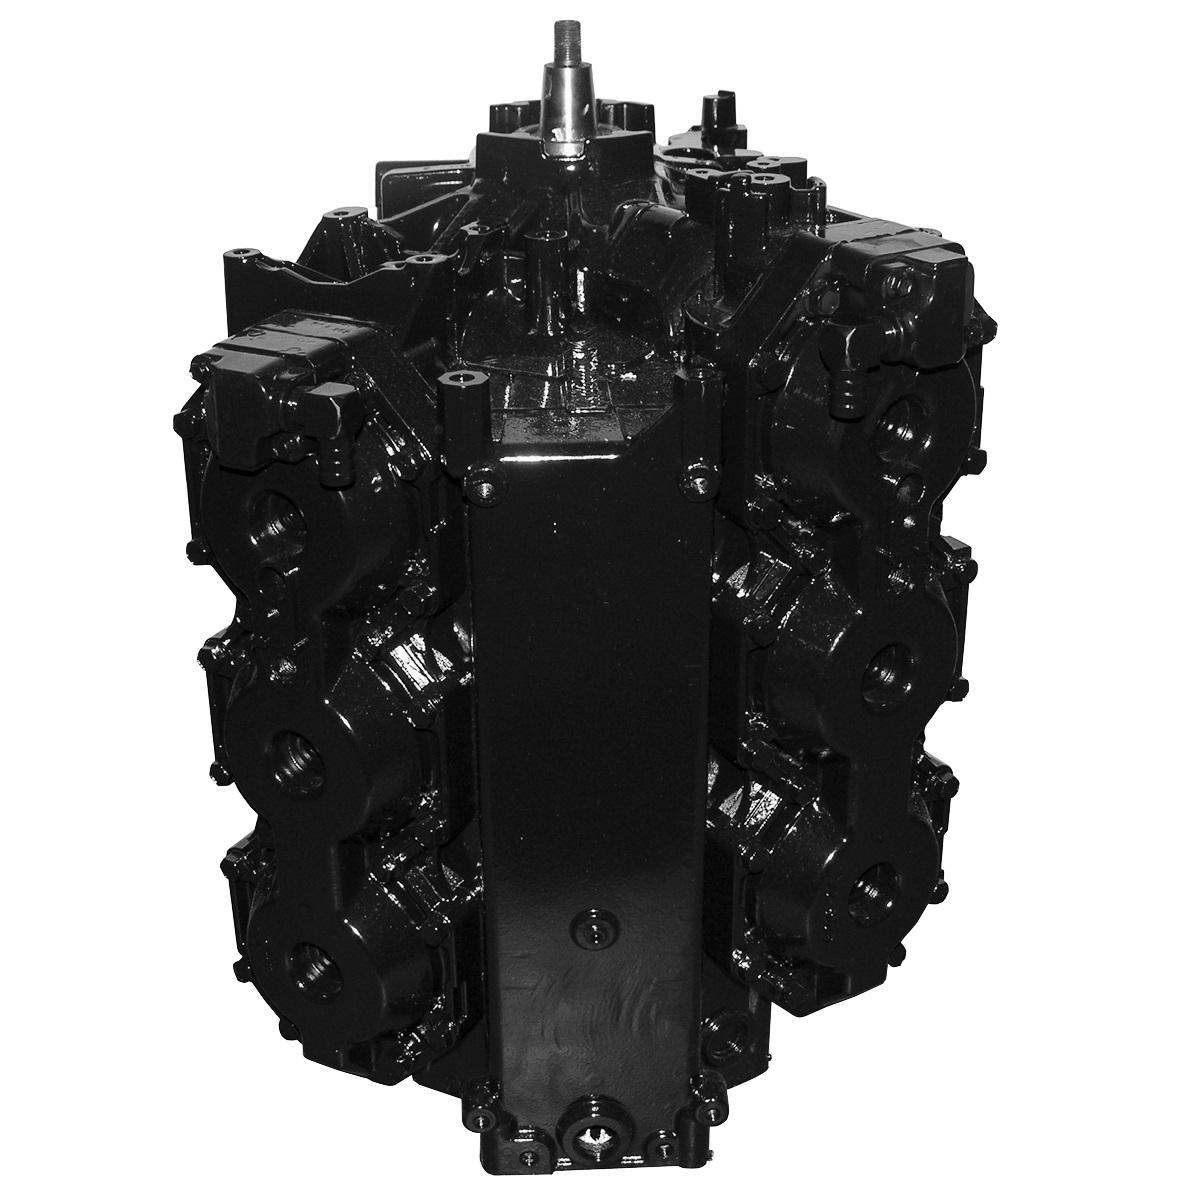 category-merc-6-cyl-powerheads.jpg